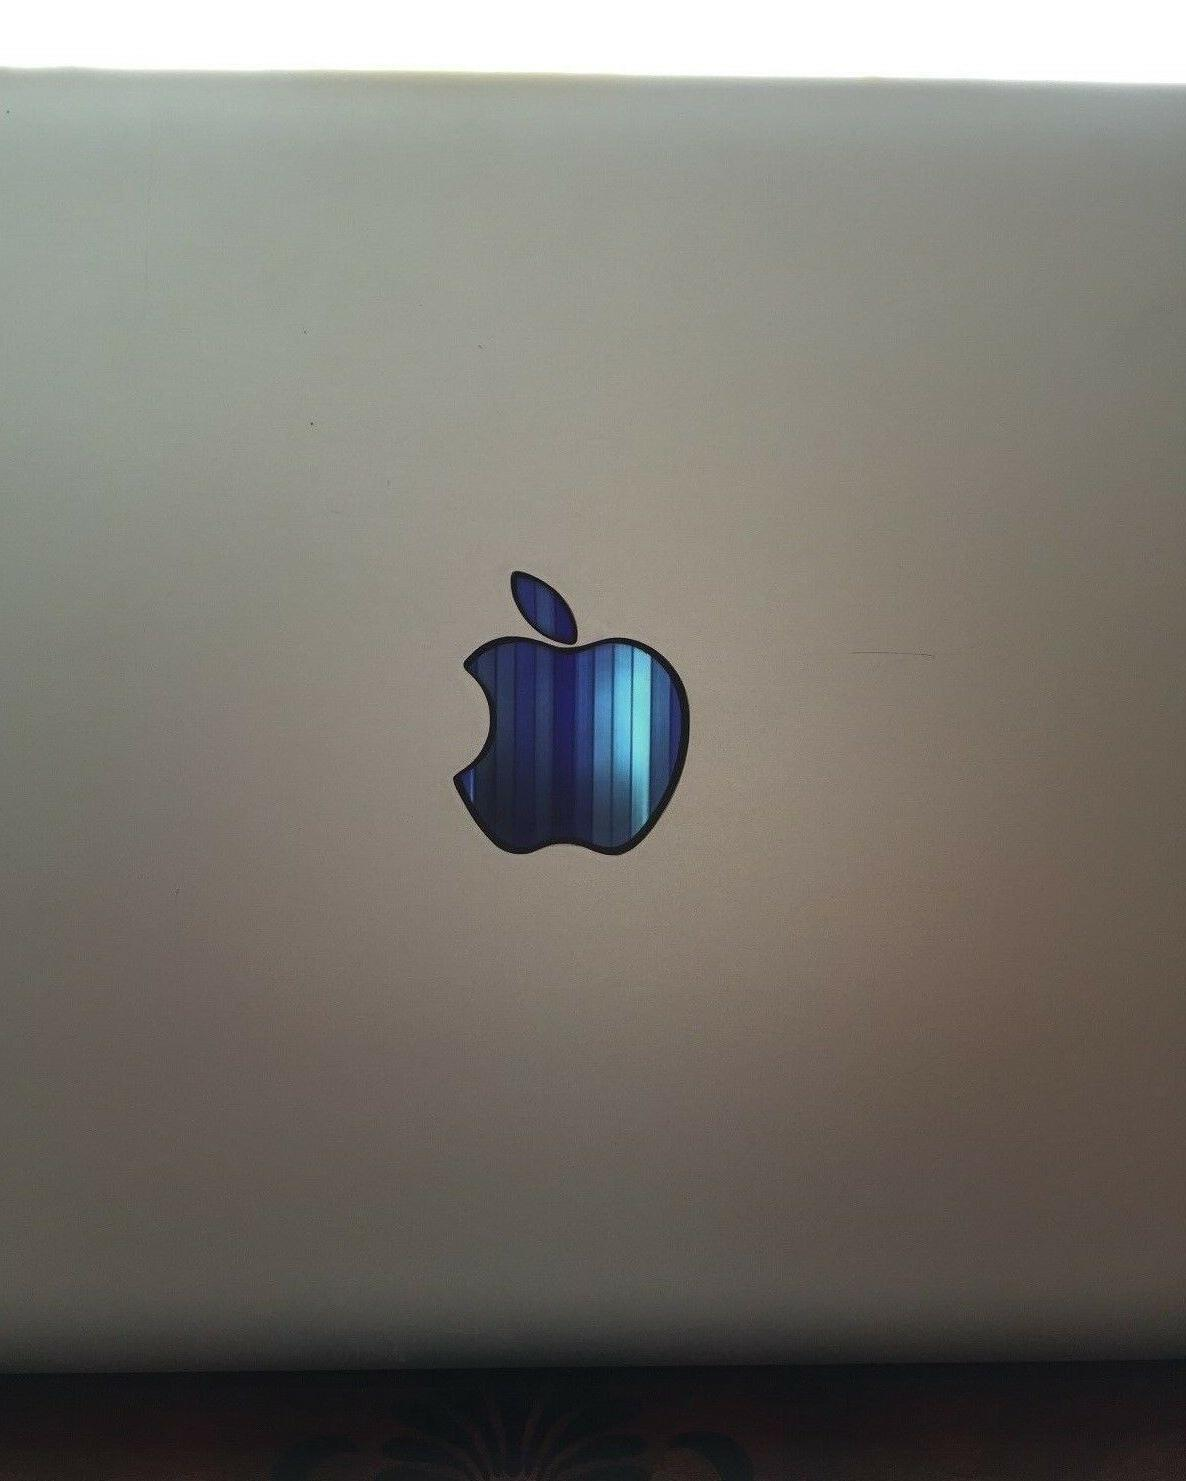 GLOWING MacBook 11 to 17in